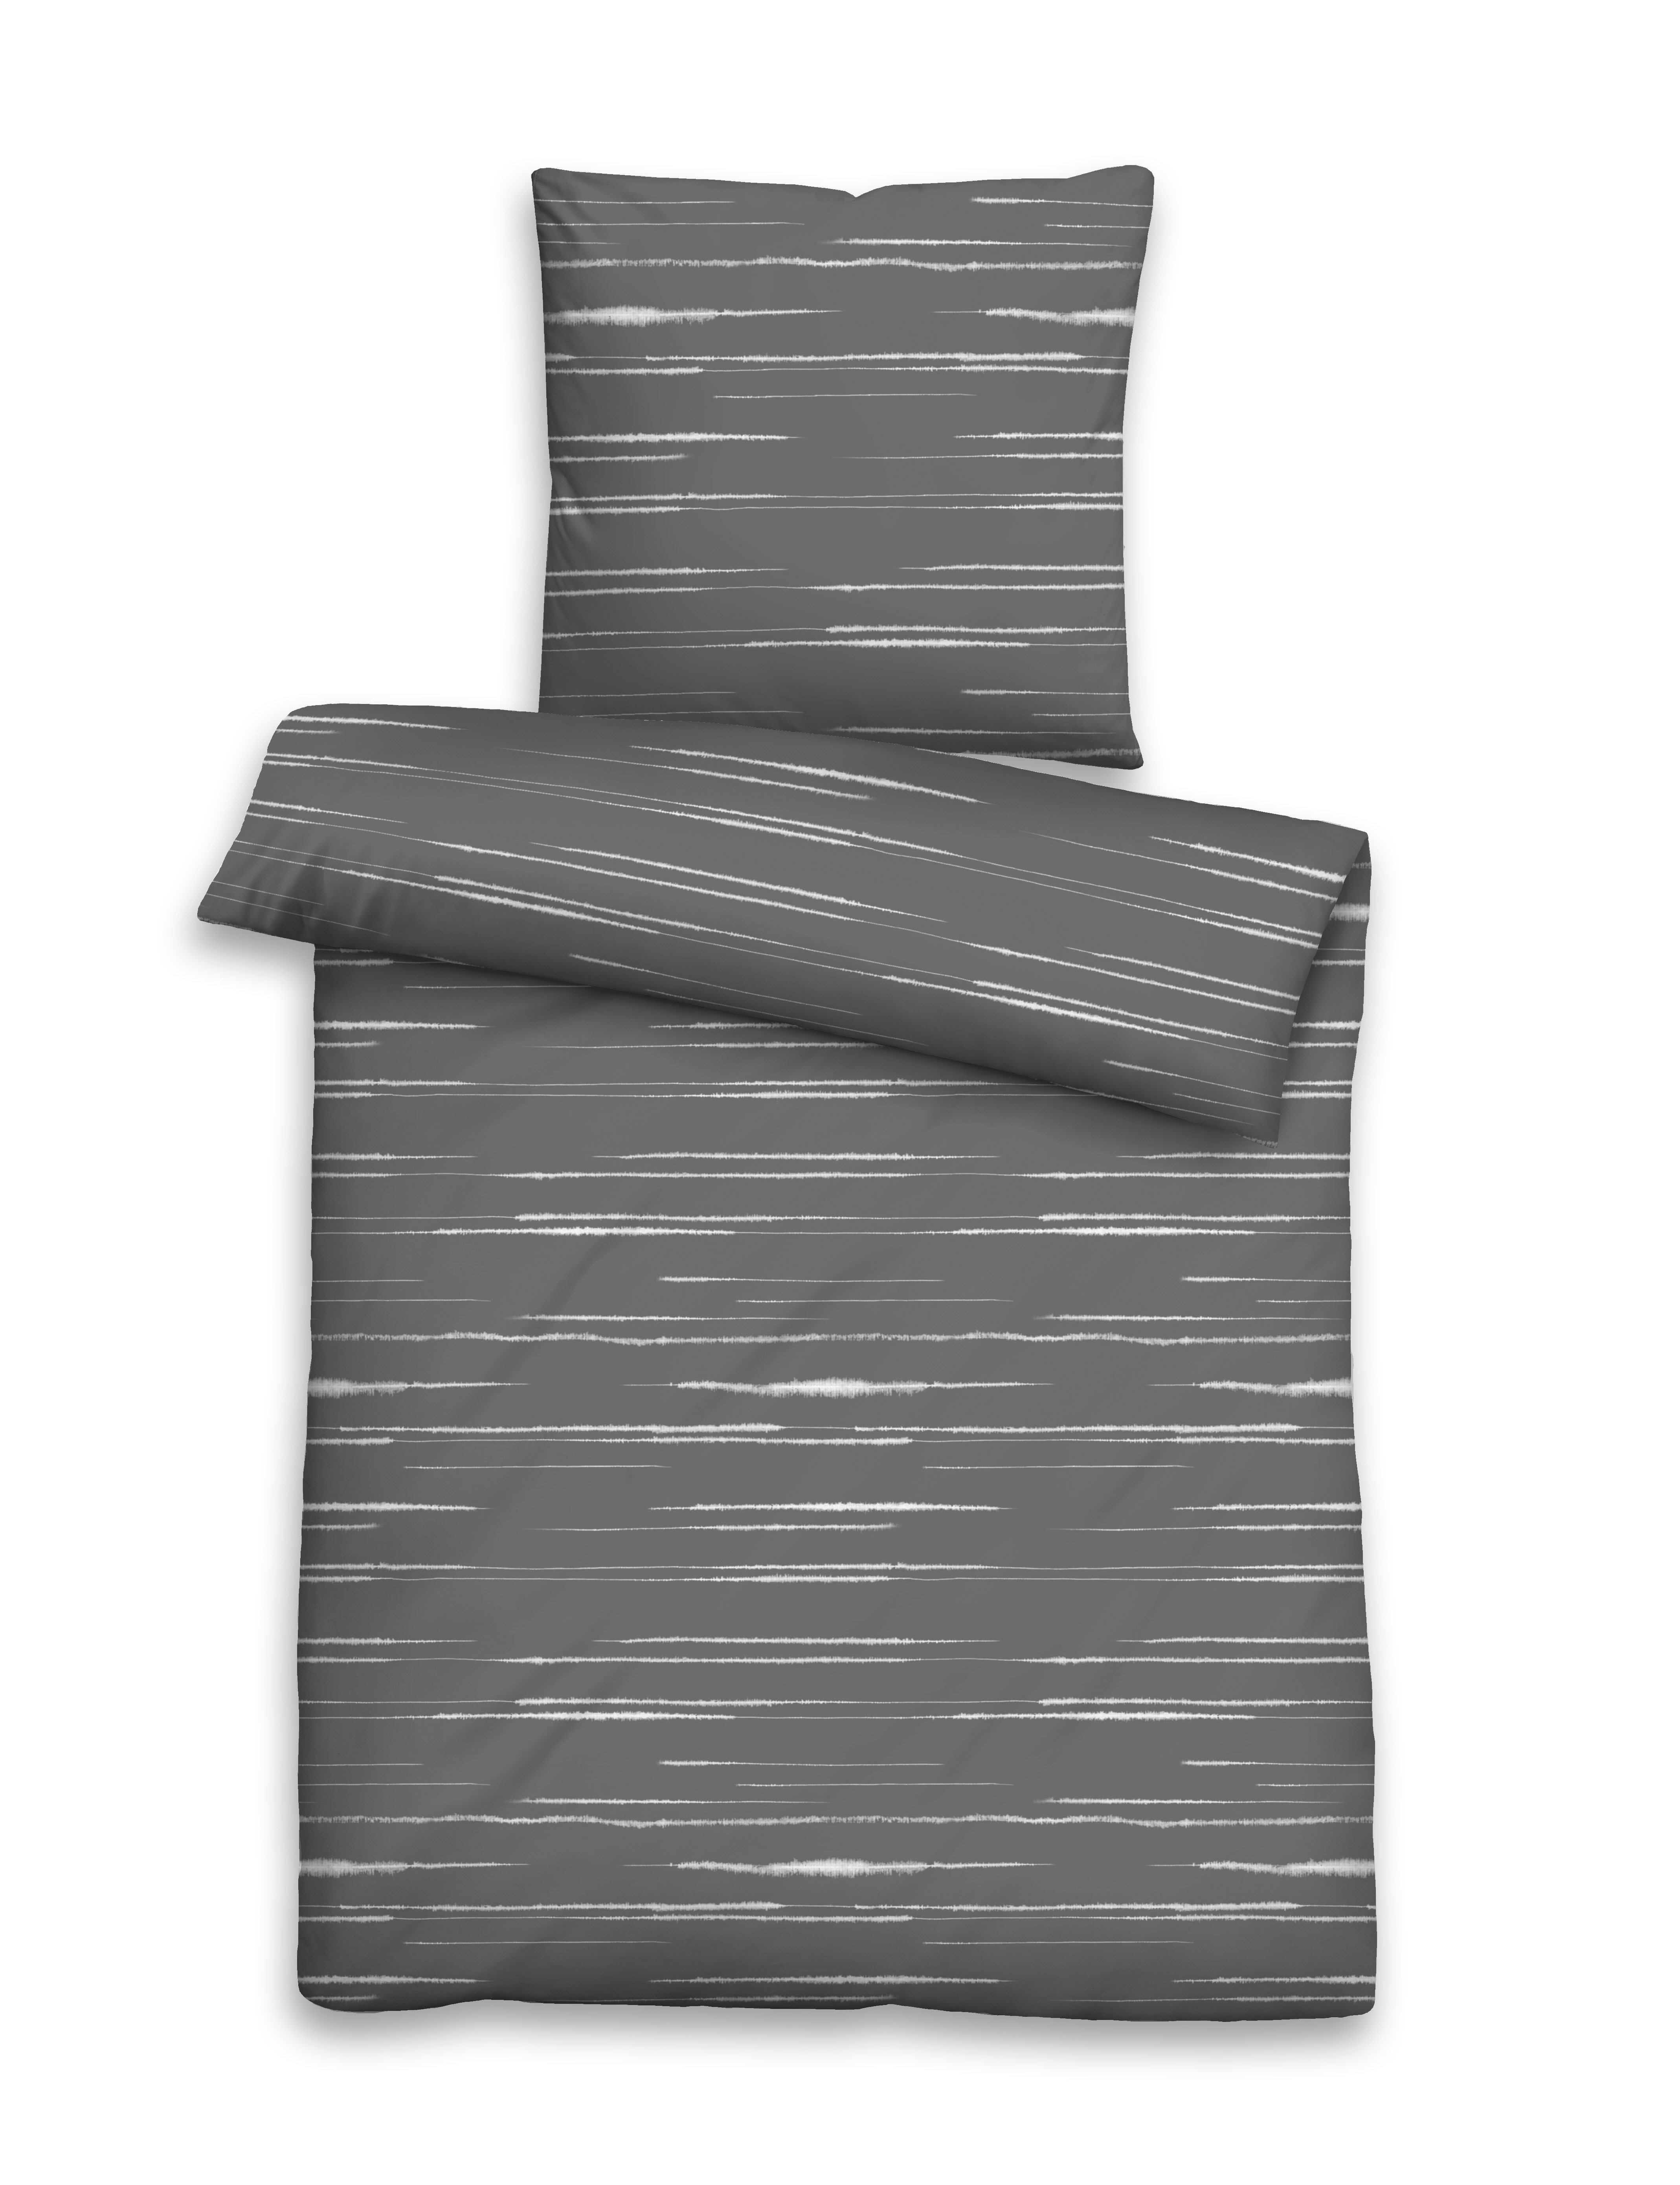 Mako-Satin Bettwäsche 155x220cm silber-grau